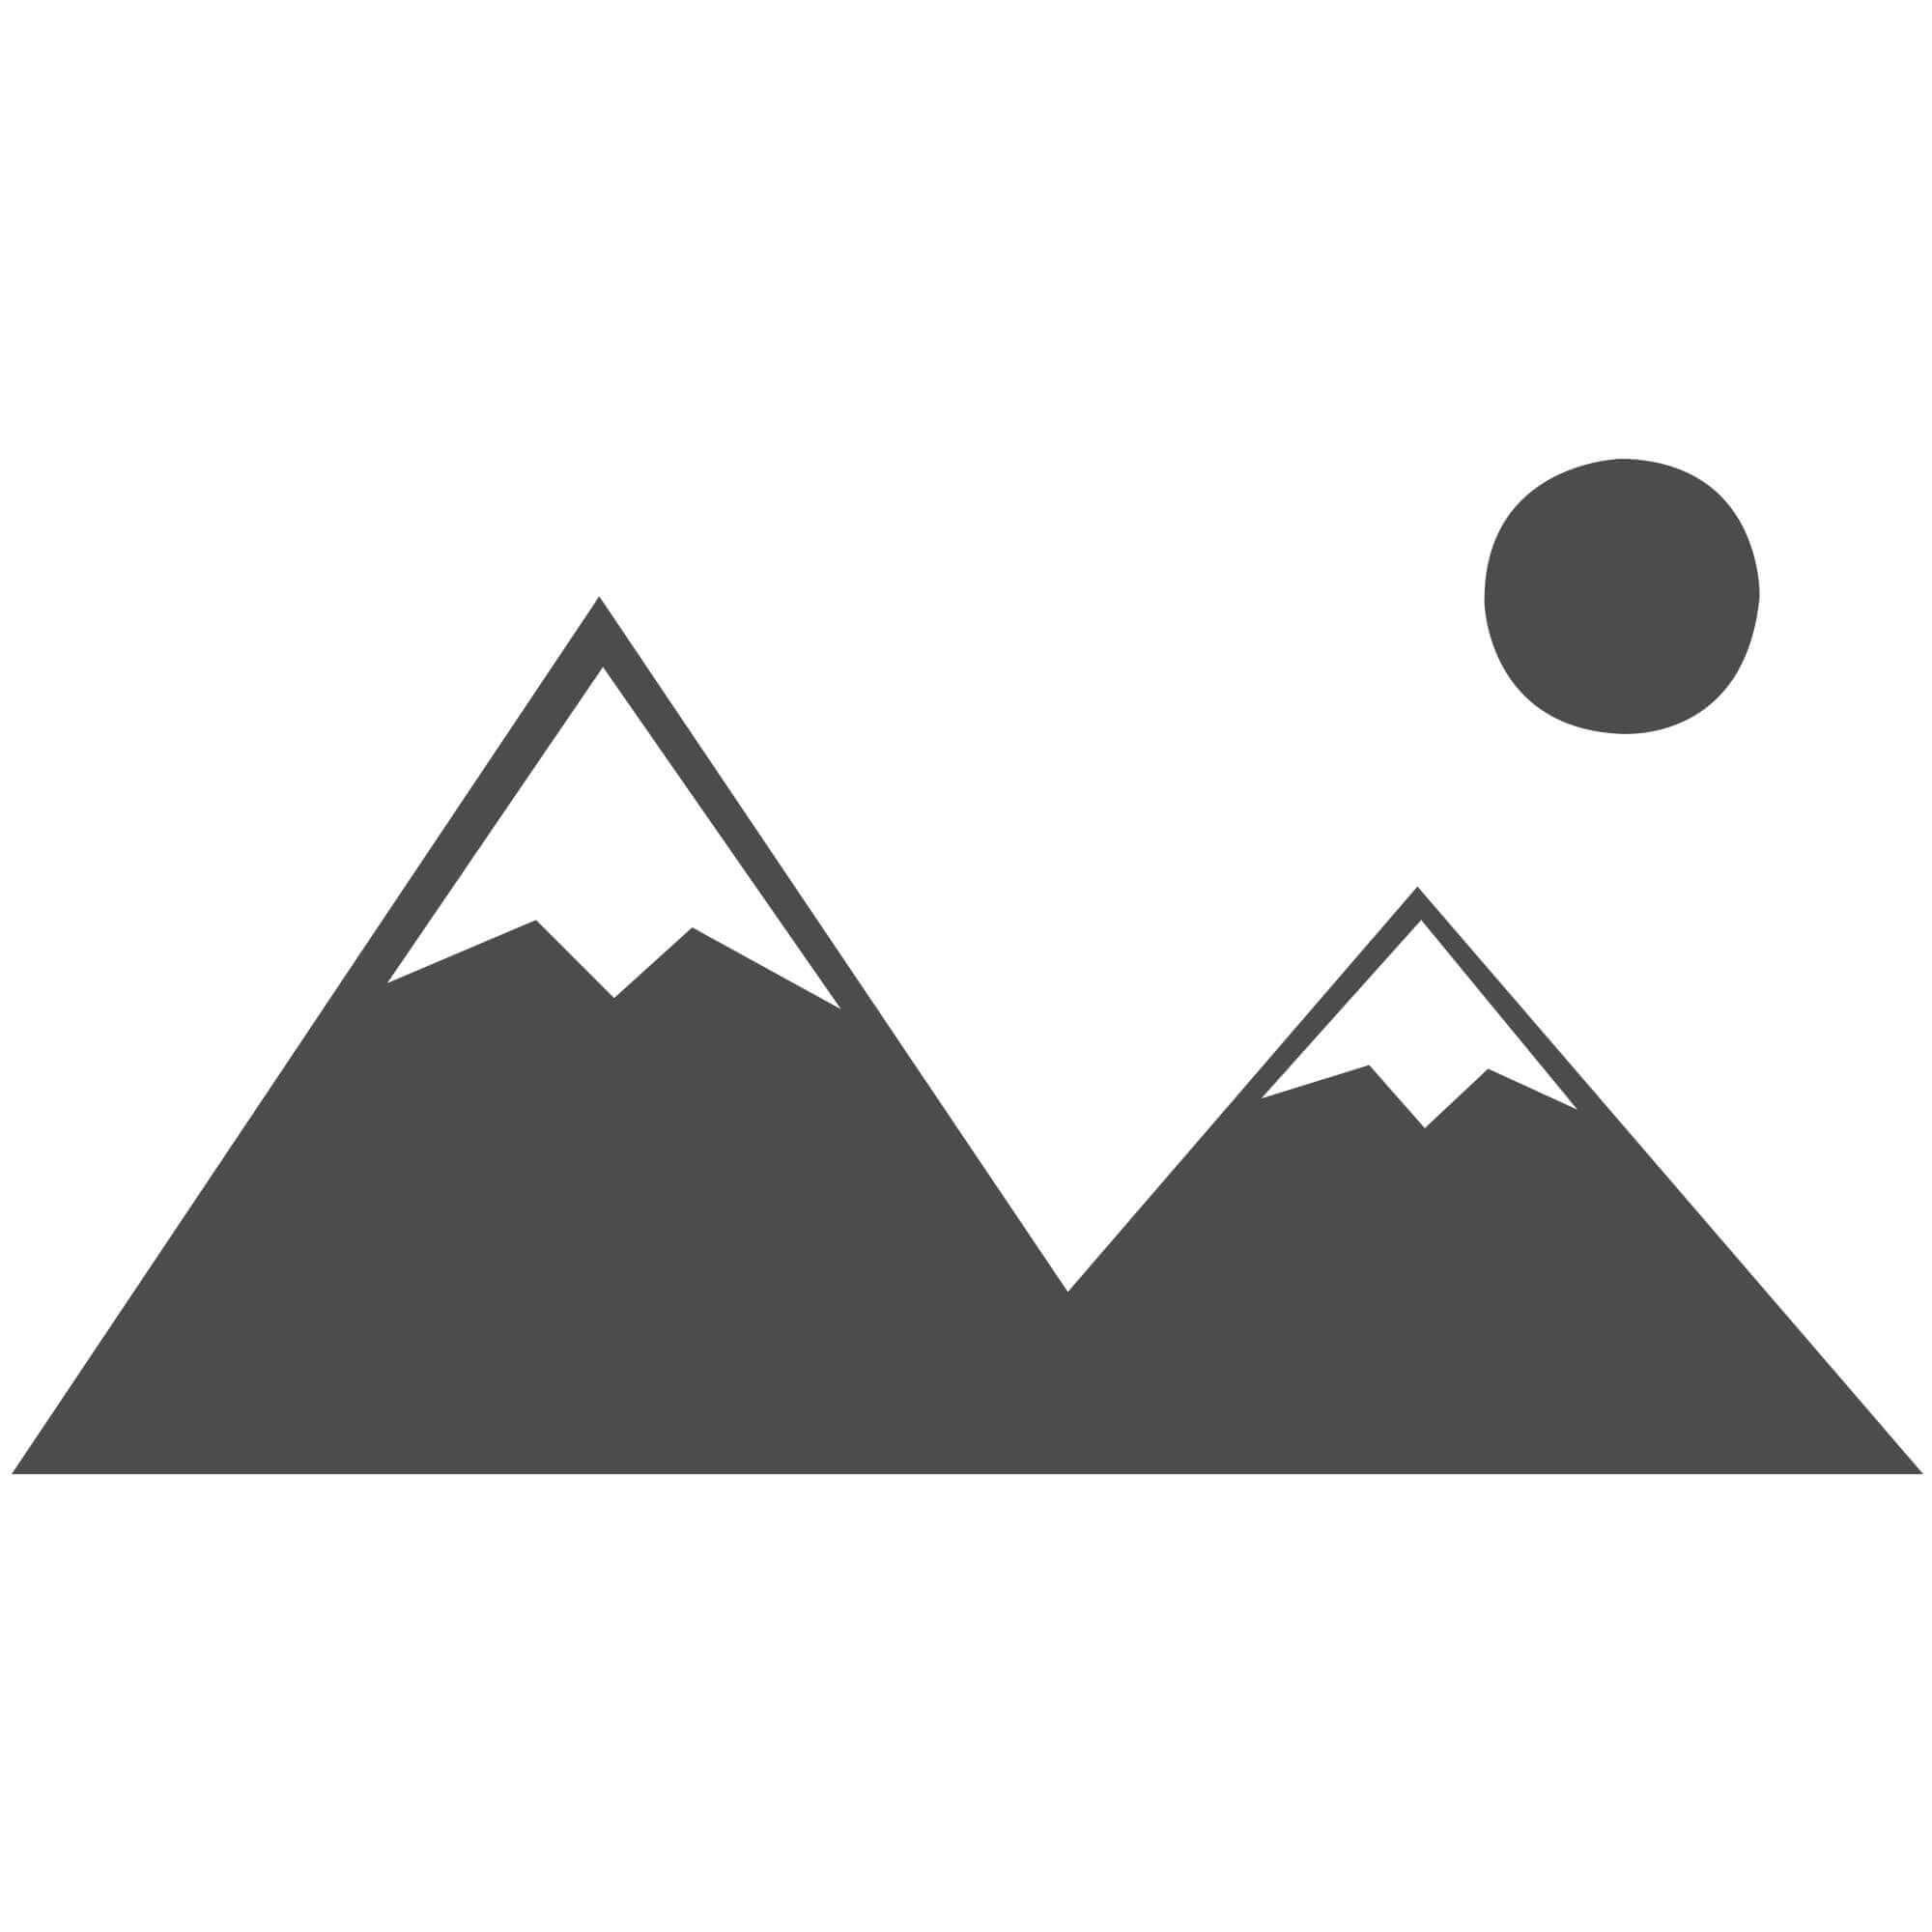 Griot Stripe Rug - Erikundi - KI806 Masala-122 x 183 cm (4' x 6')